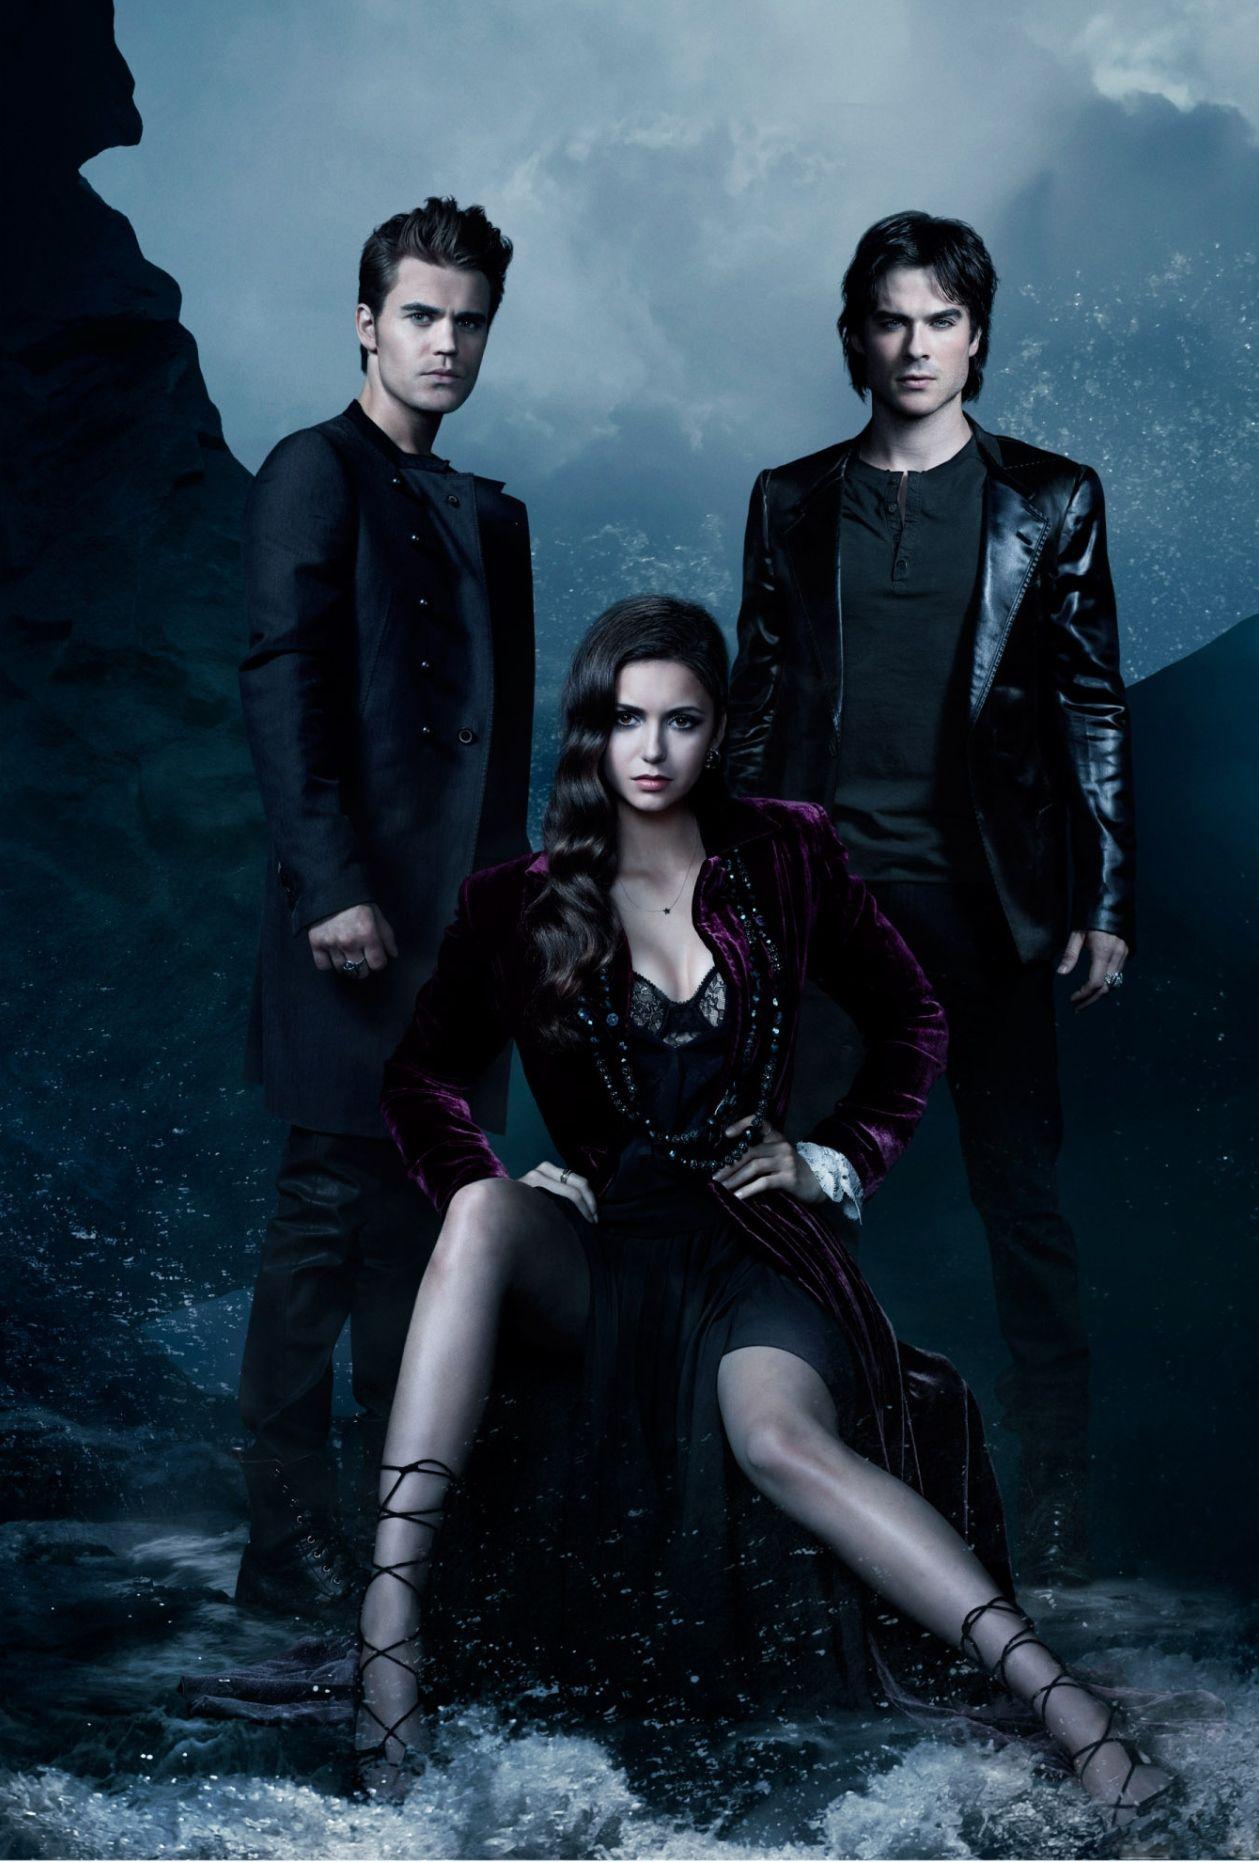 Tvd Cast Vampire Diaries Season 5 Vampire Diaries Seasons Vampire Diaries Wallpaper